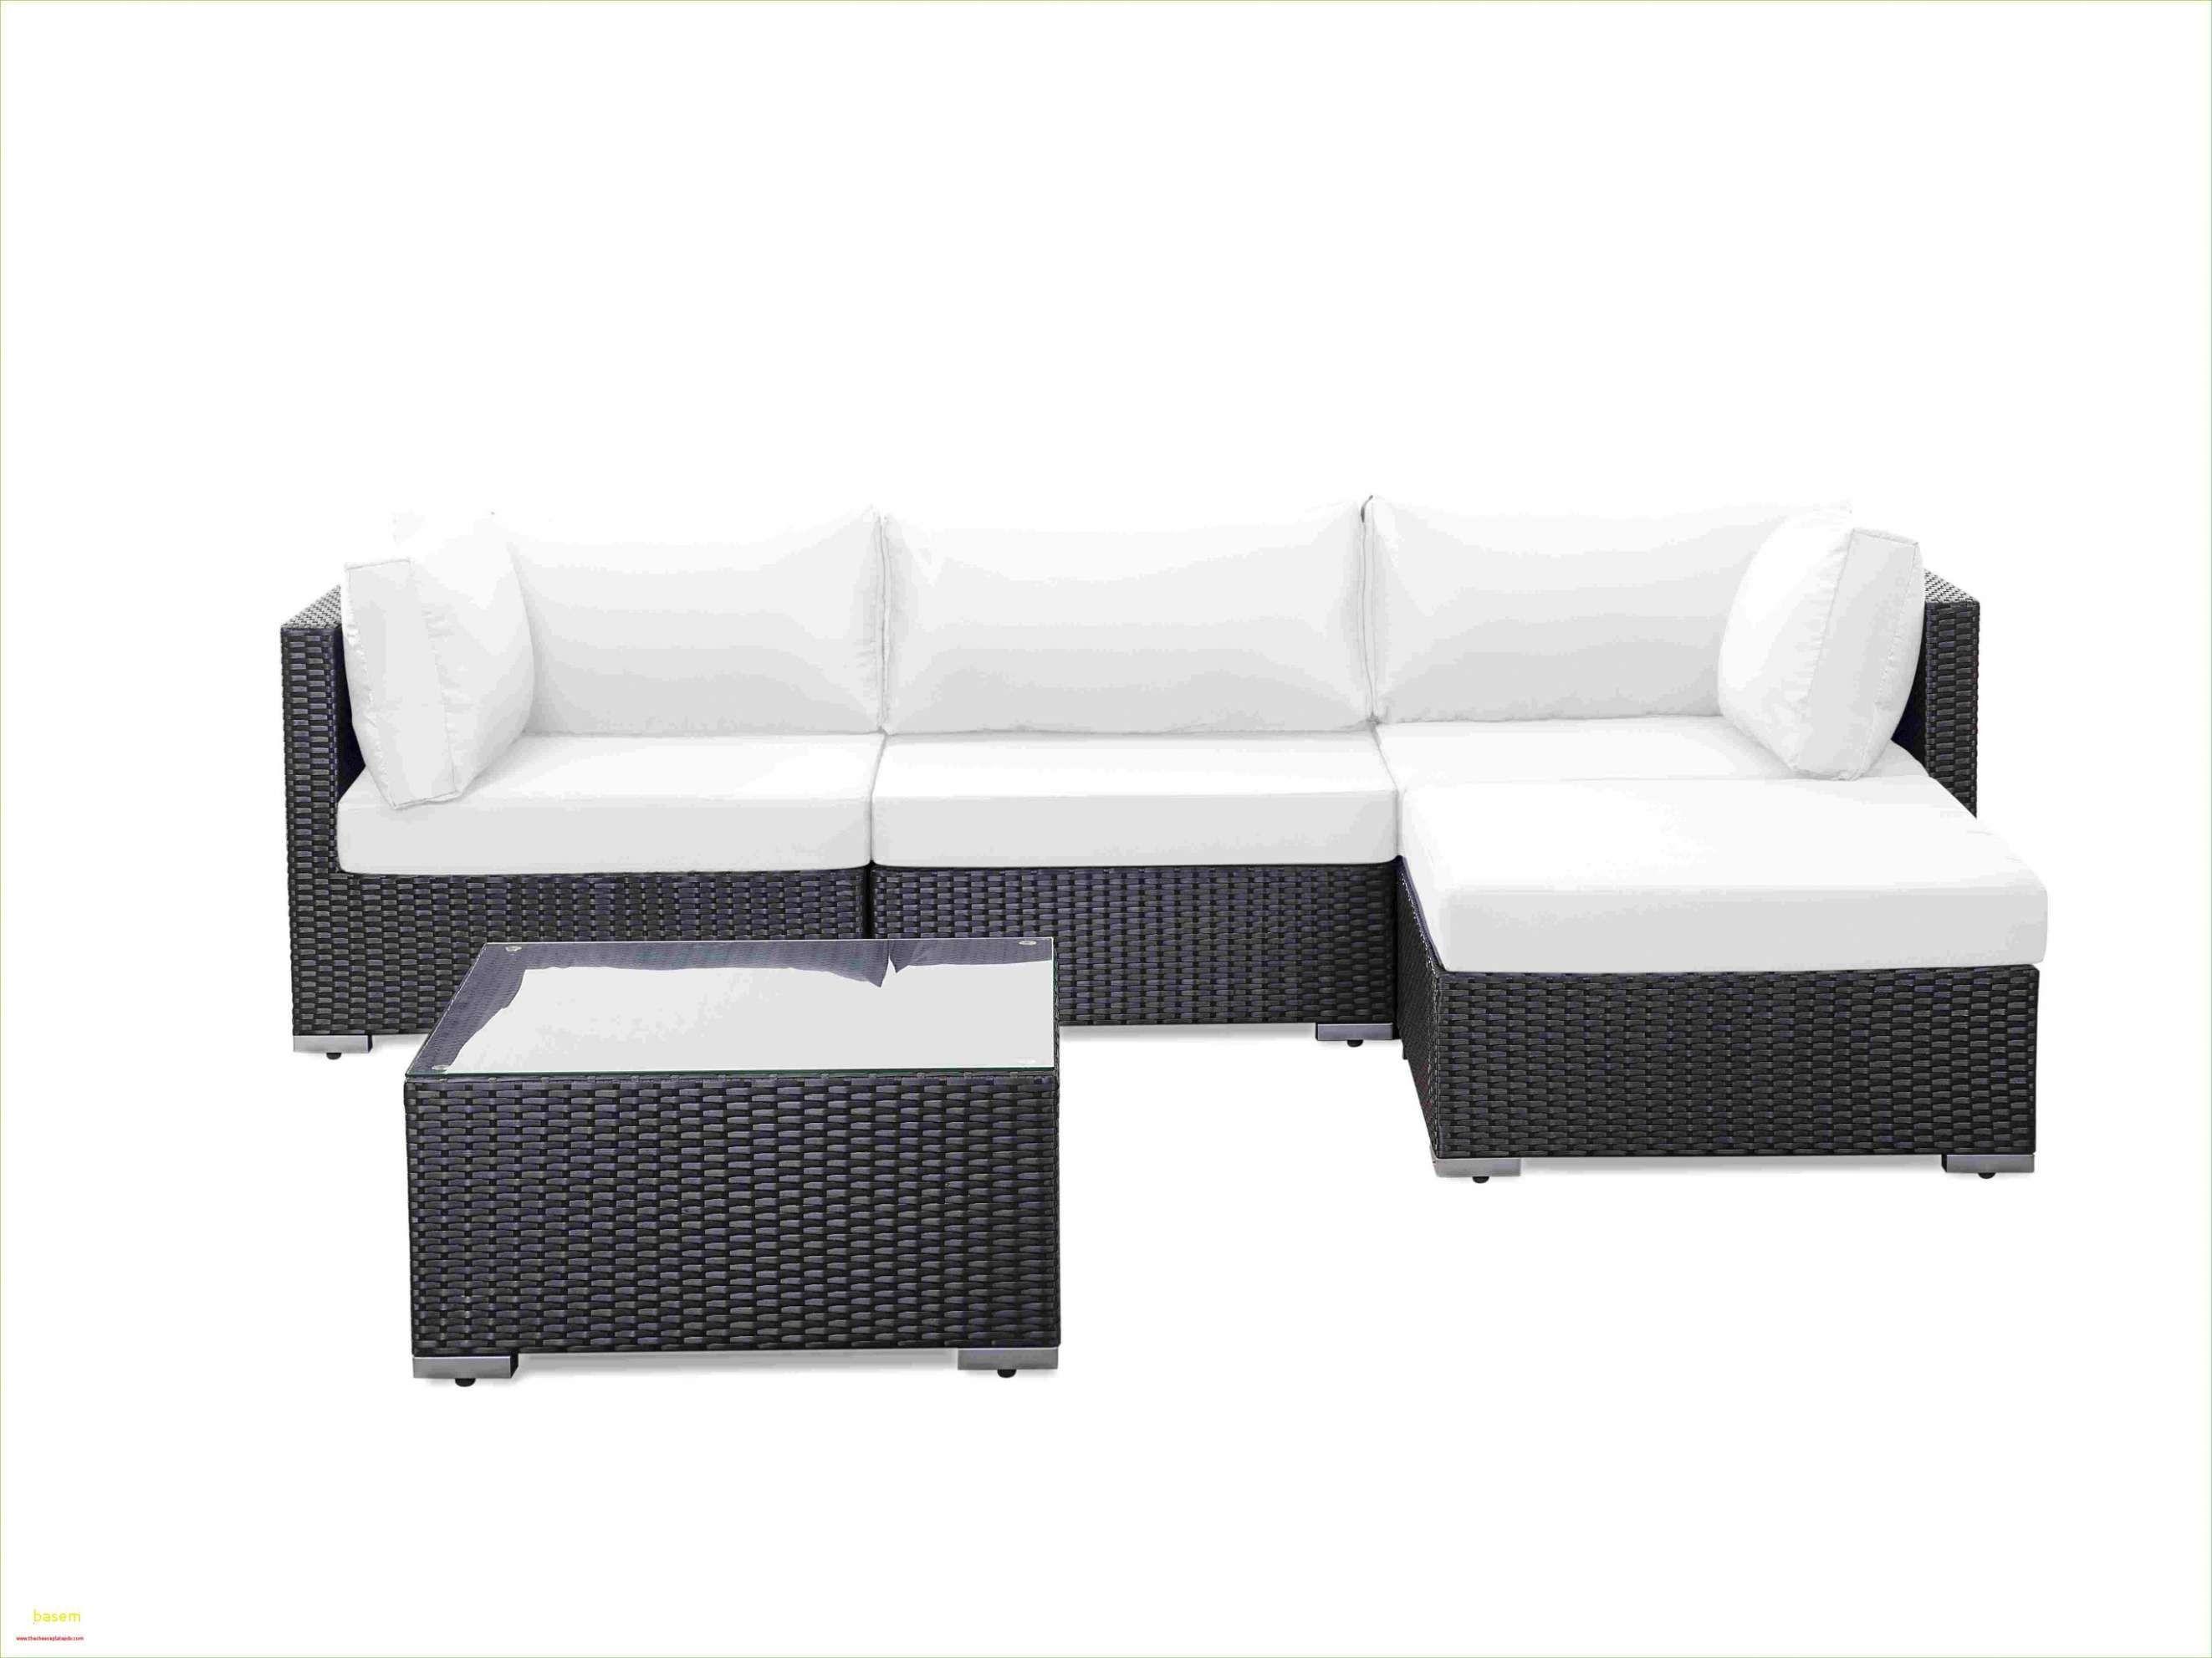 Design 44 Fur Aldi Nord Gartenmobel 2016 Check More At Https Www Estadoproperties Com Aldi Nord Gartenmobel 2016 Aussenmobel Lounge Mobel Balkonmobel